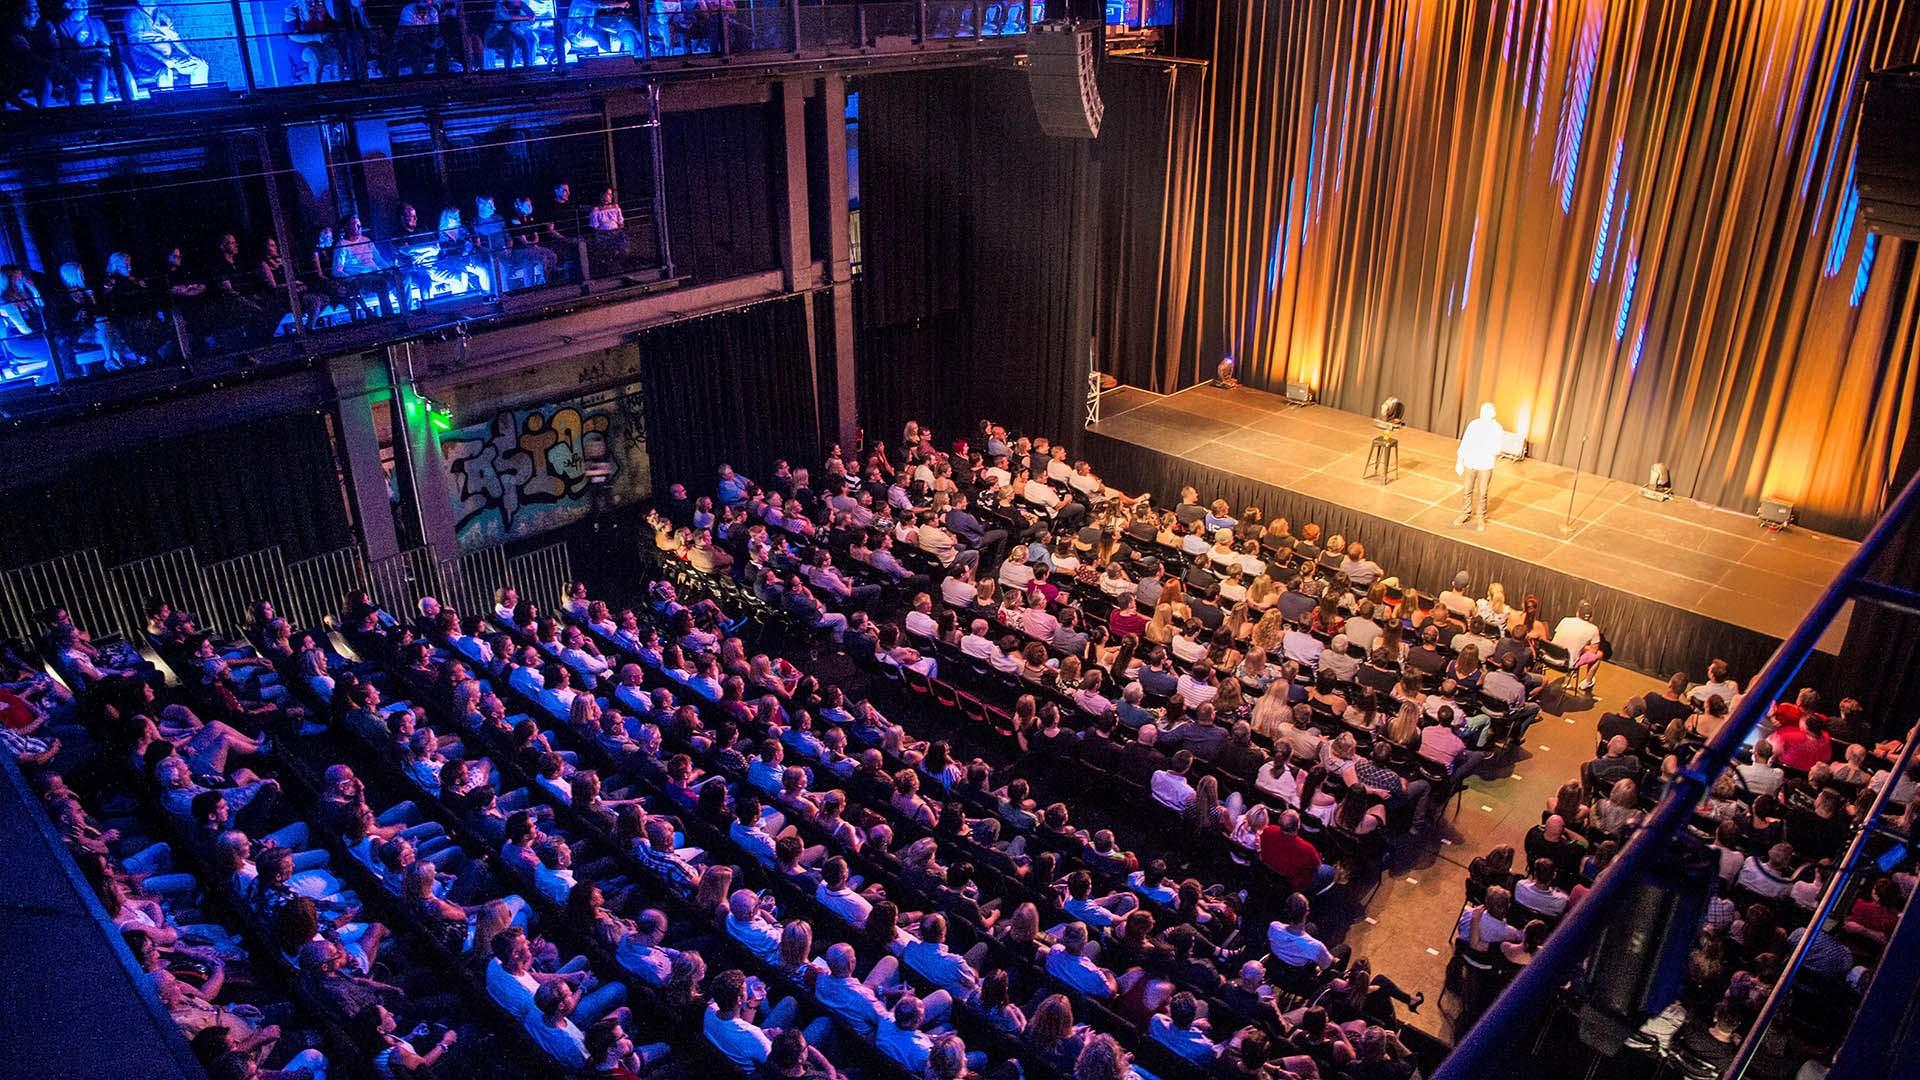 Brisbane Comedy Festival 2021 Take 2